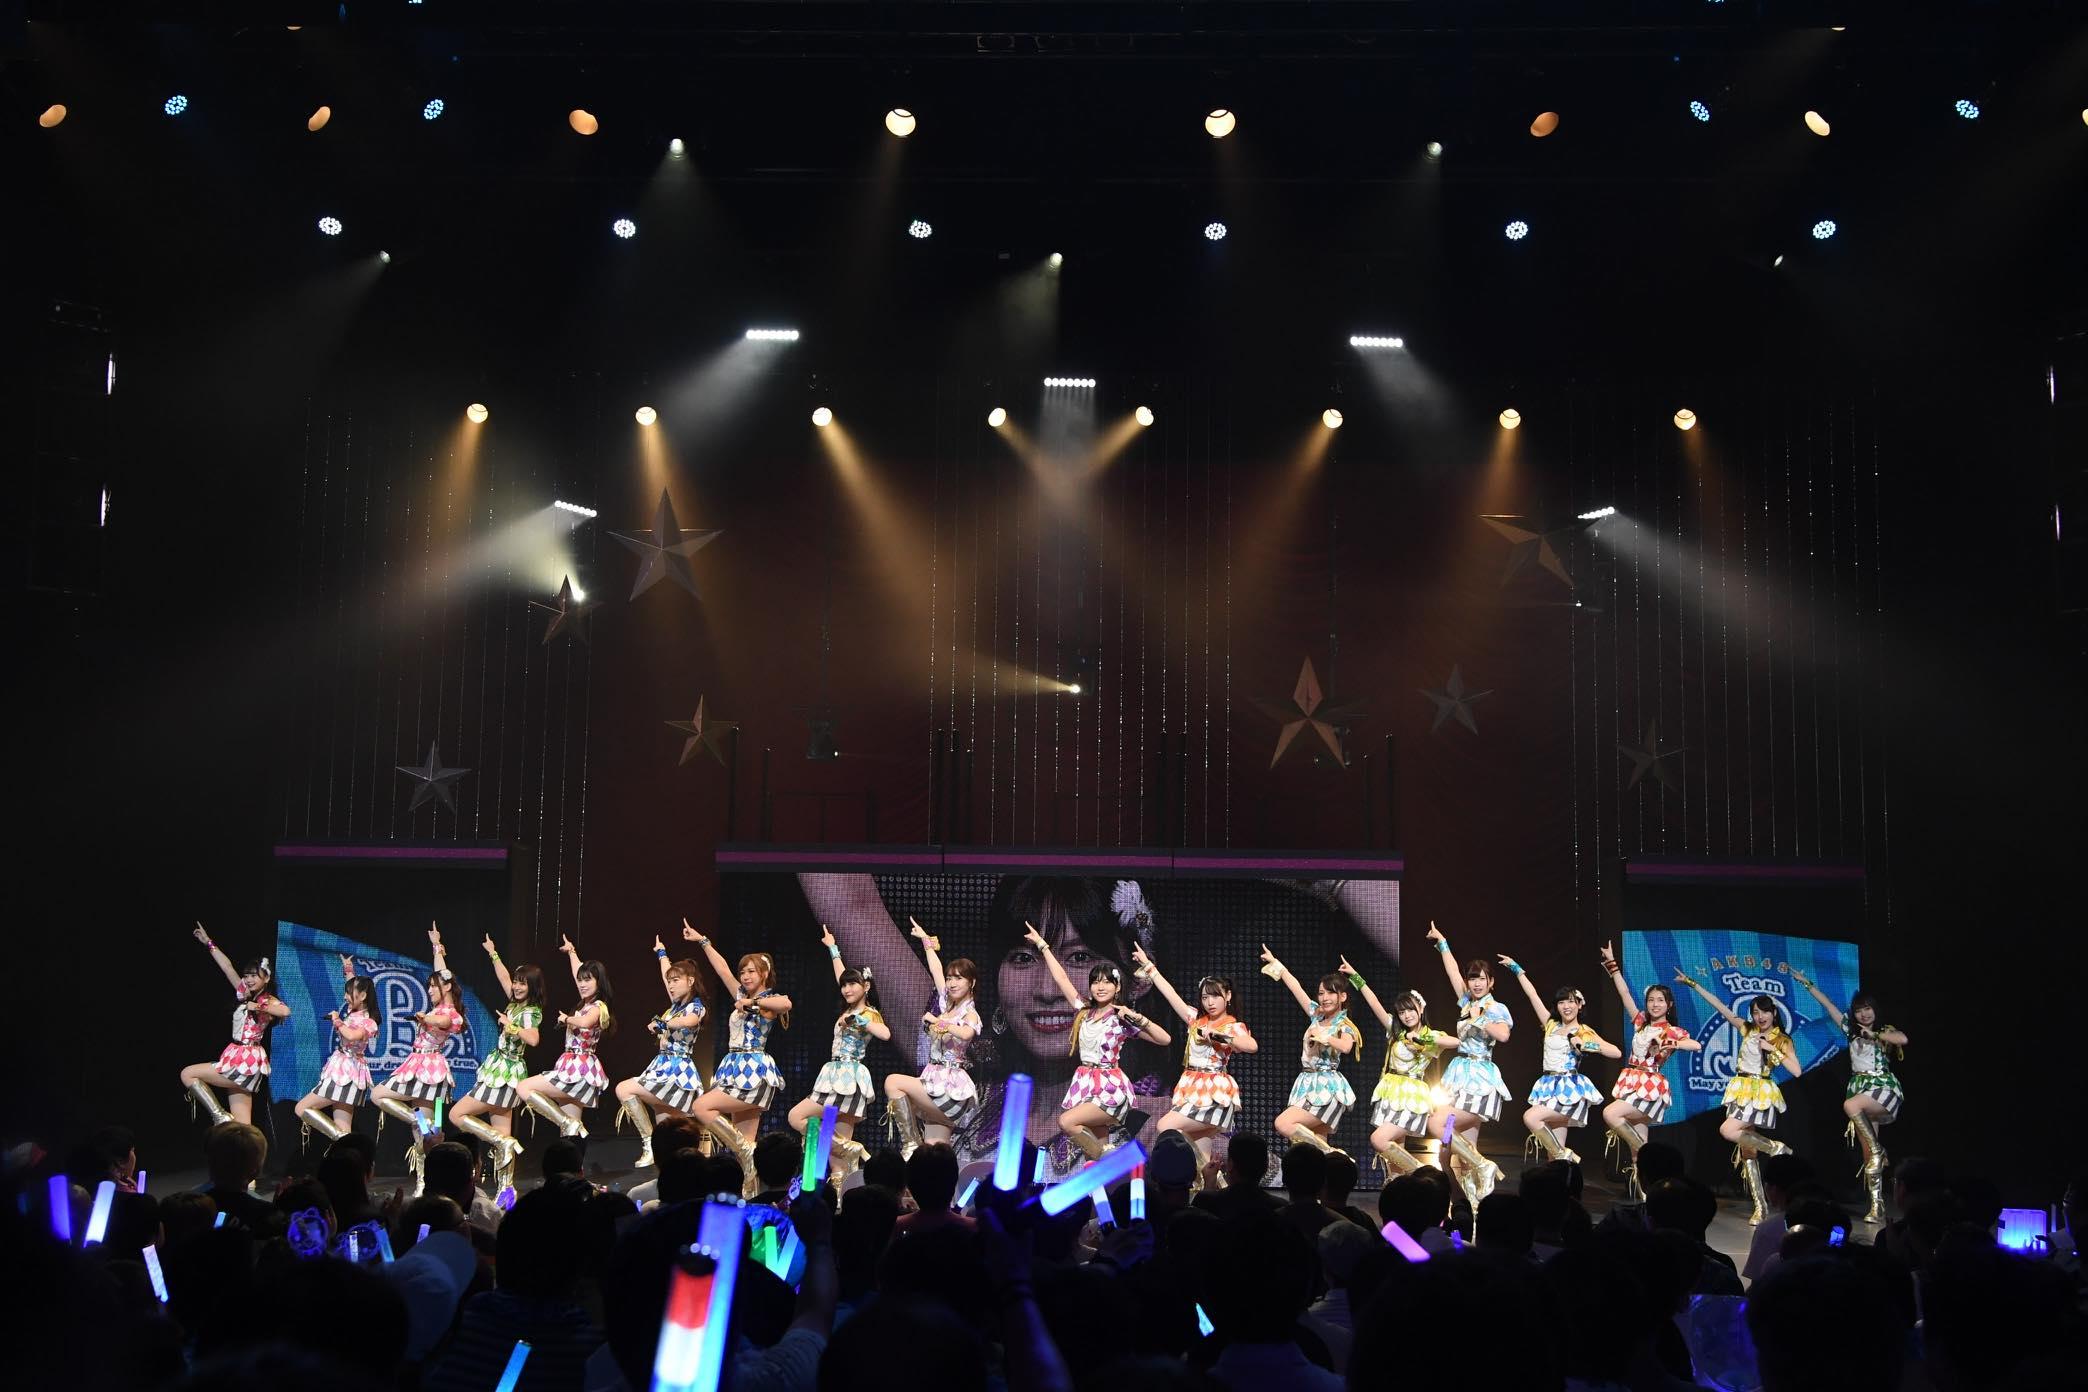 AKB48全国ツアー「神奈川公演」開催、チームBとチーム4のパワーが炸裂!【写真17枚】の画像008